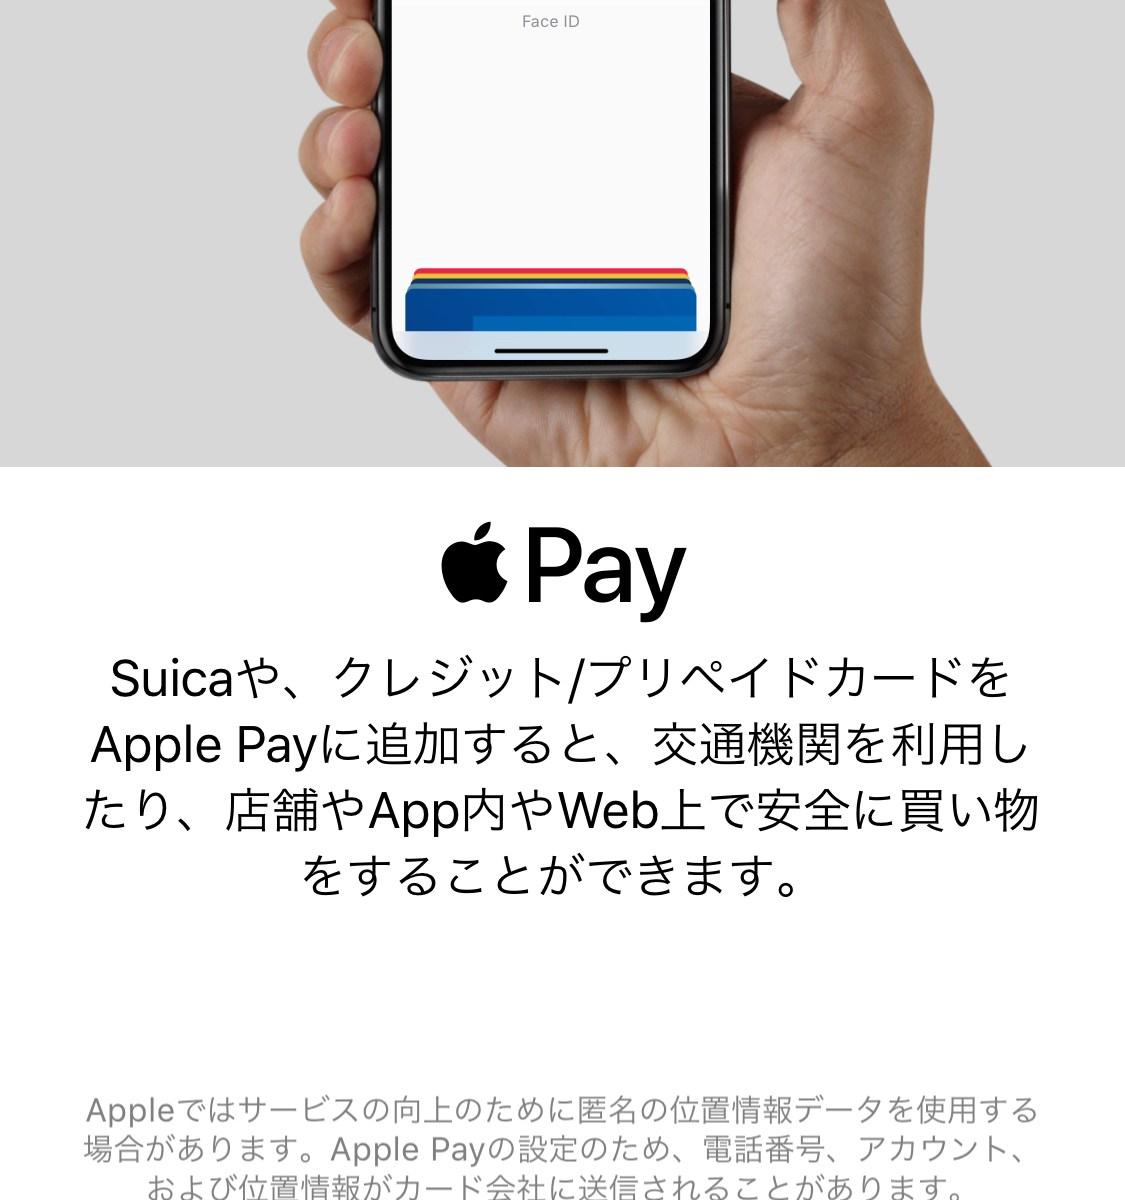 iPhone X モバイルSuica移行出来ない問題